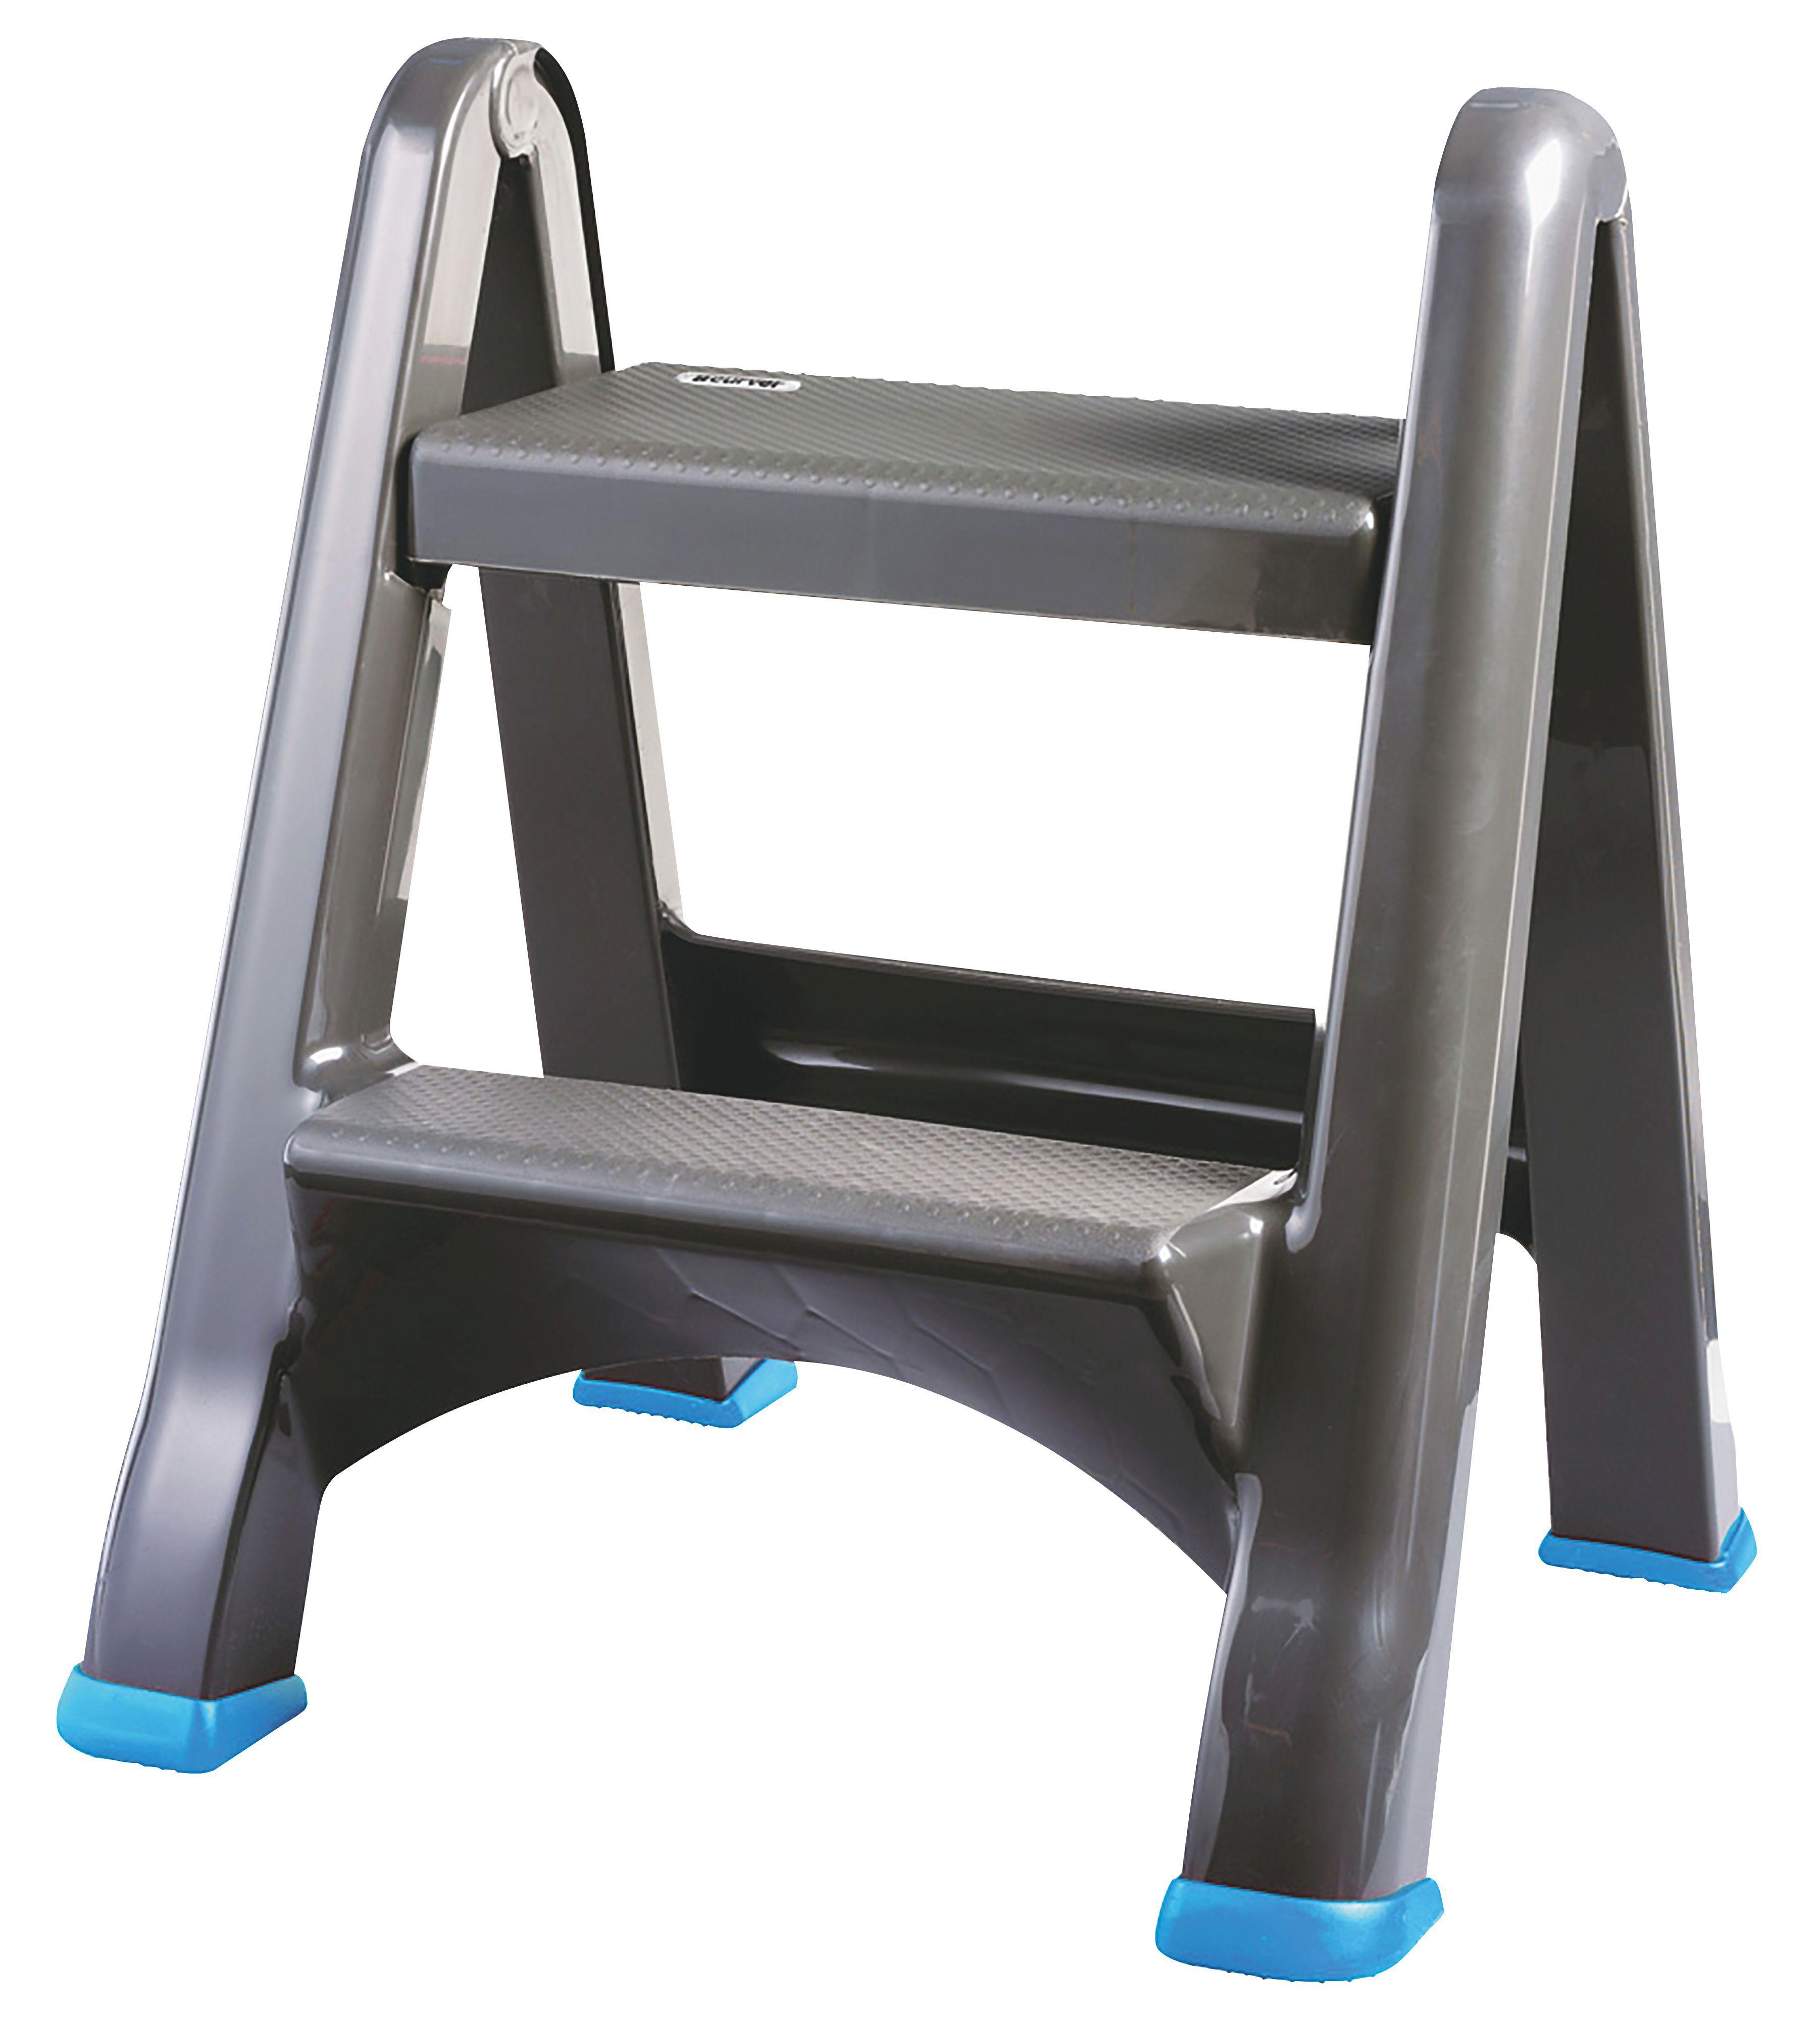 sc 1 st  Bu0026Q & Mac Allister 2 Tread Plastic Step Stool | Departments | DIY at Bu0026Q islam-shia.org